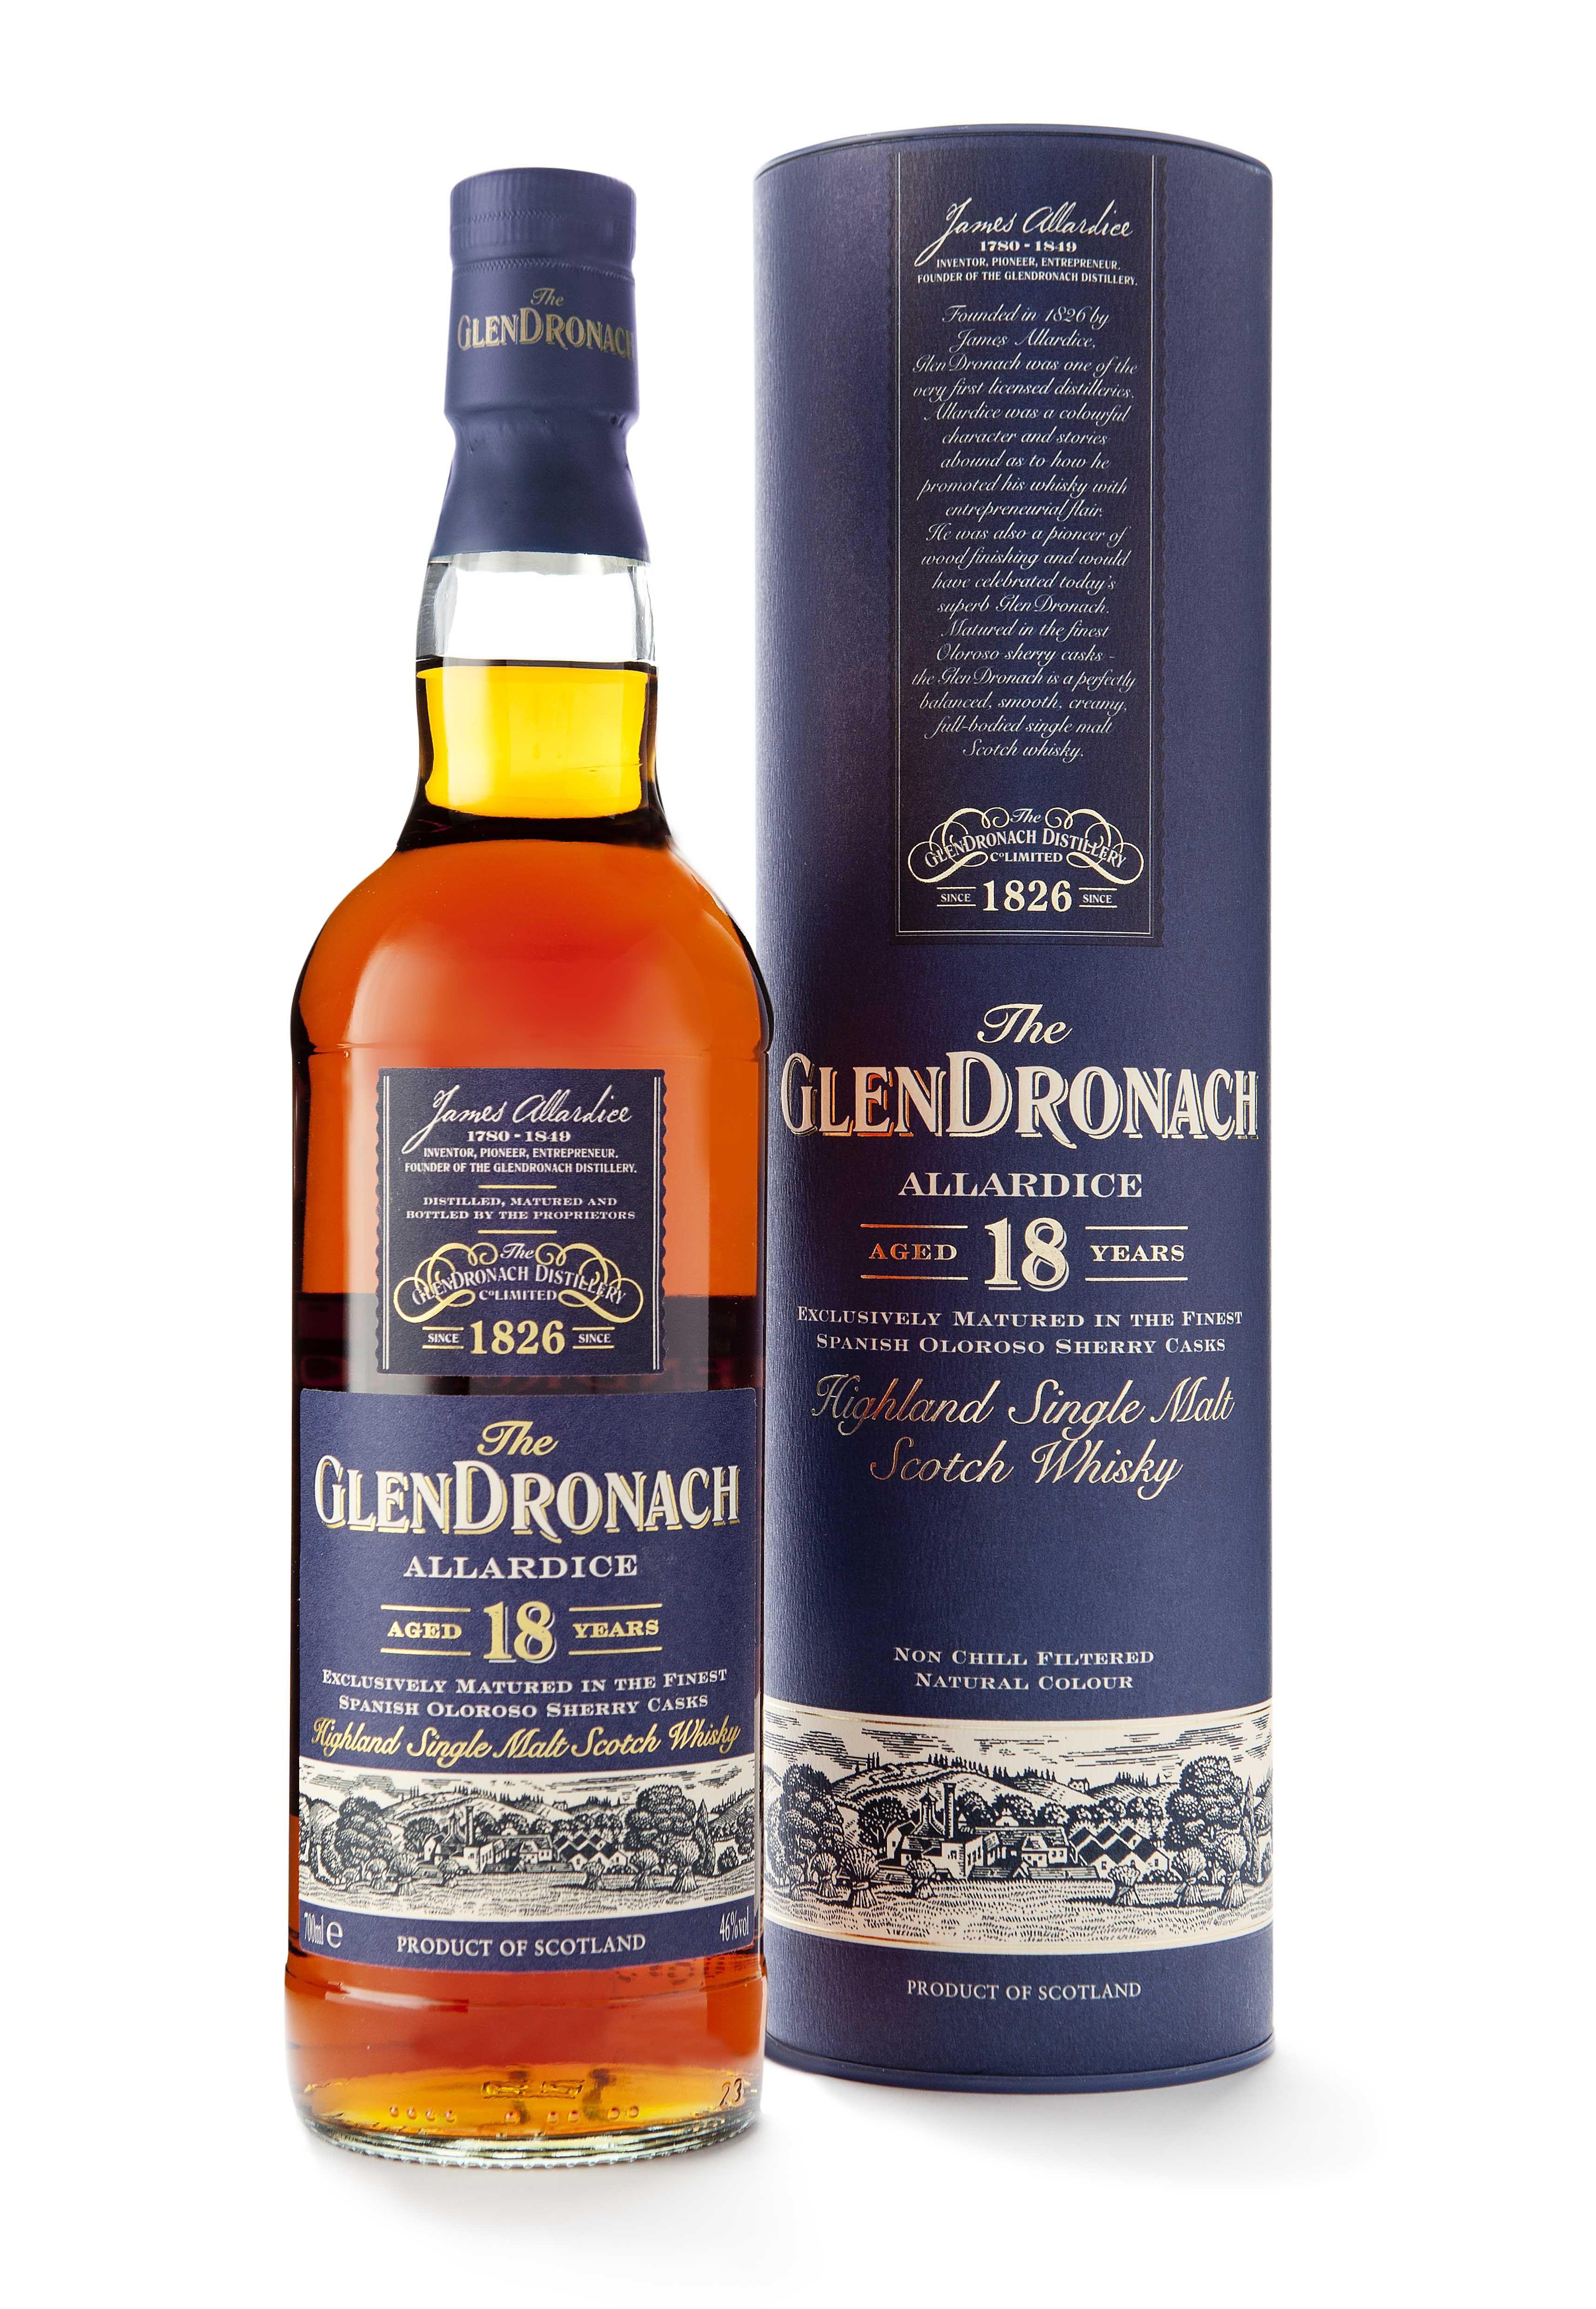 f88b80ecd19 ... malt   blended bottles of scotch whisky. GlenDronach 18YO Allardice -  This sounds fascinating. I would love a bottle.